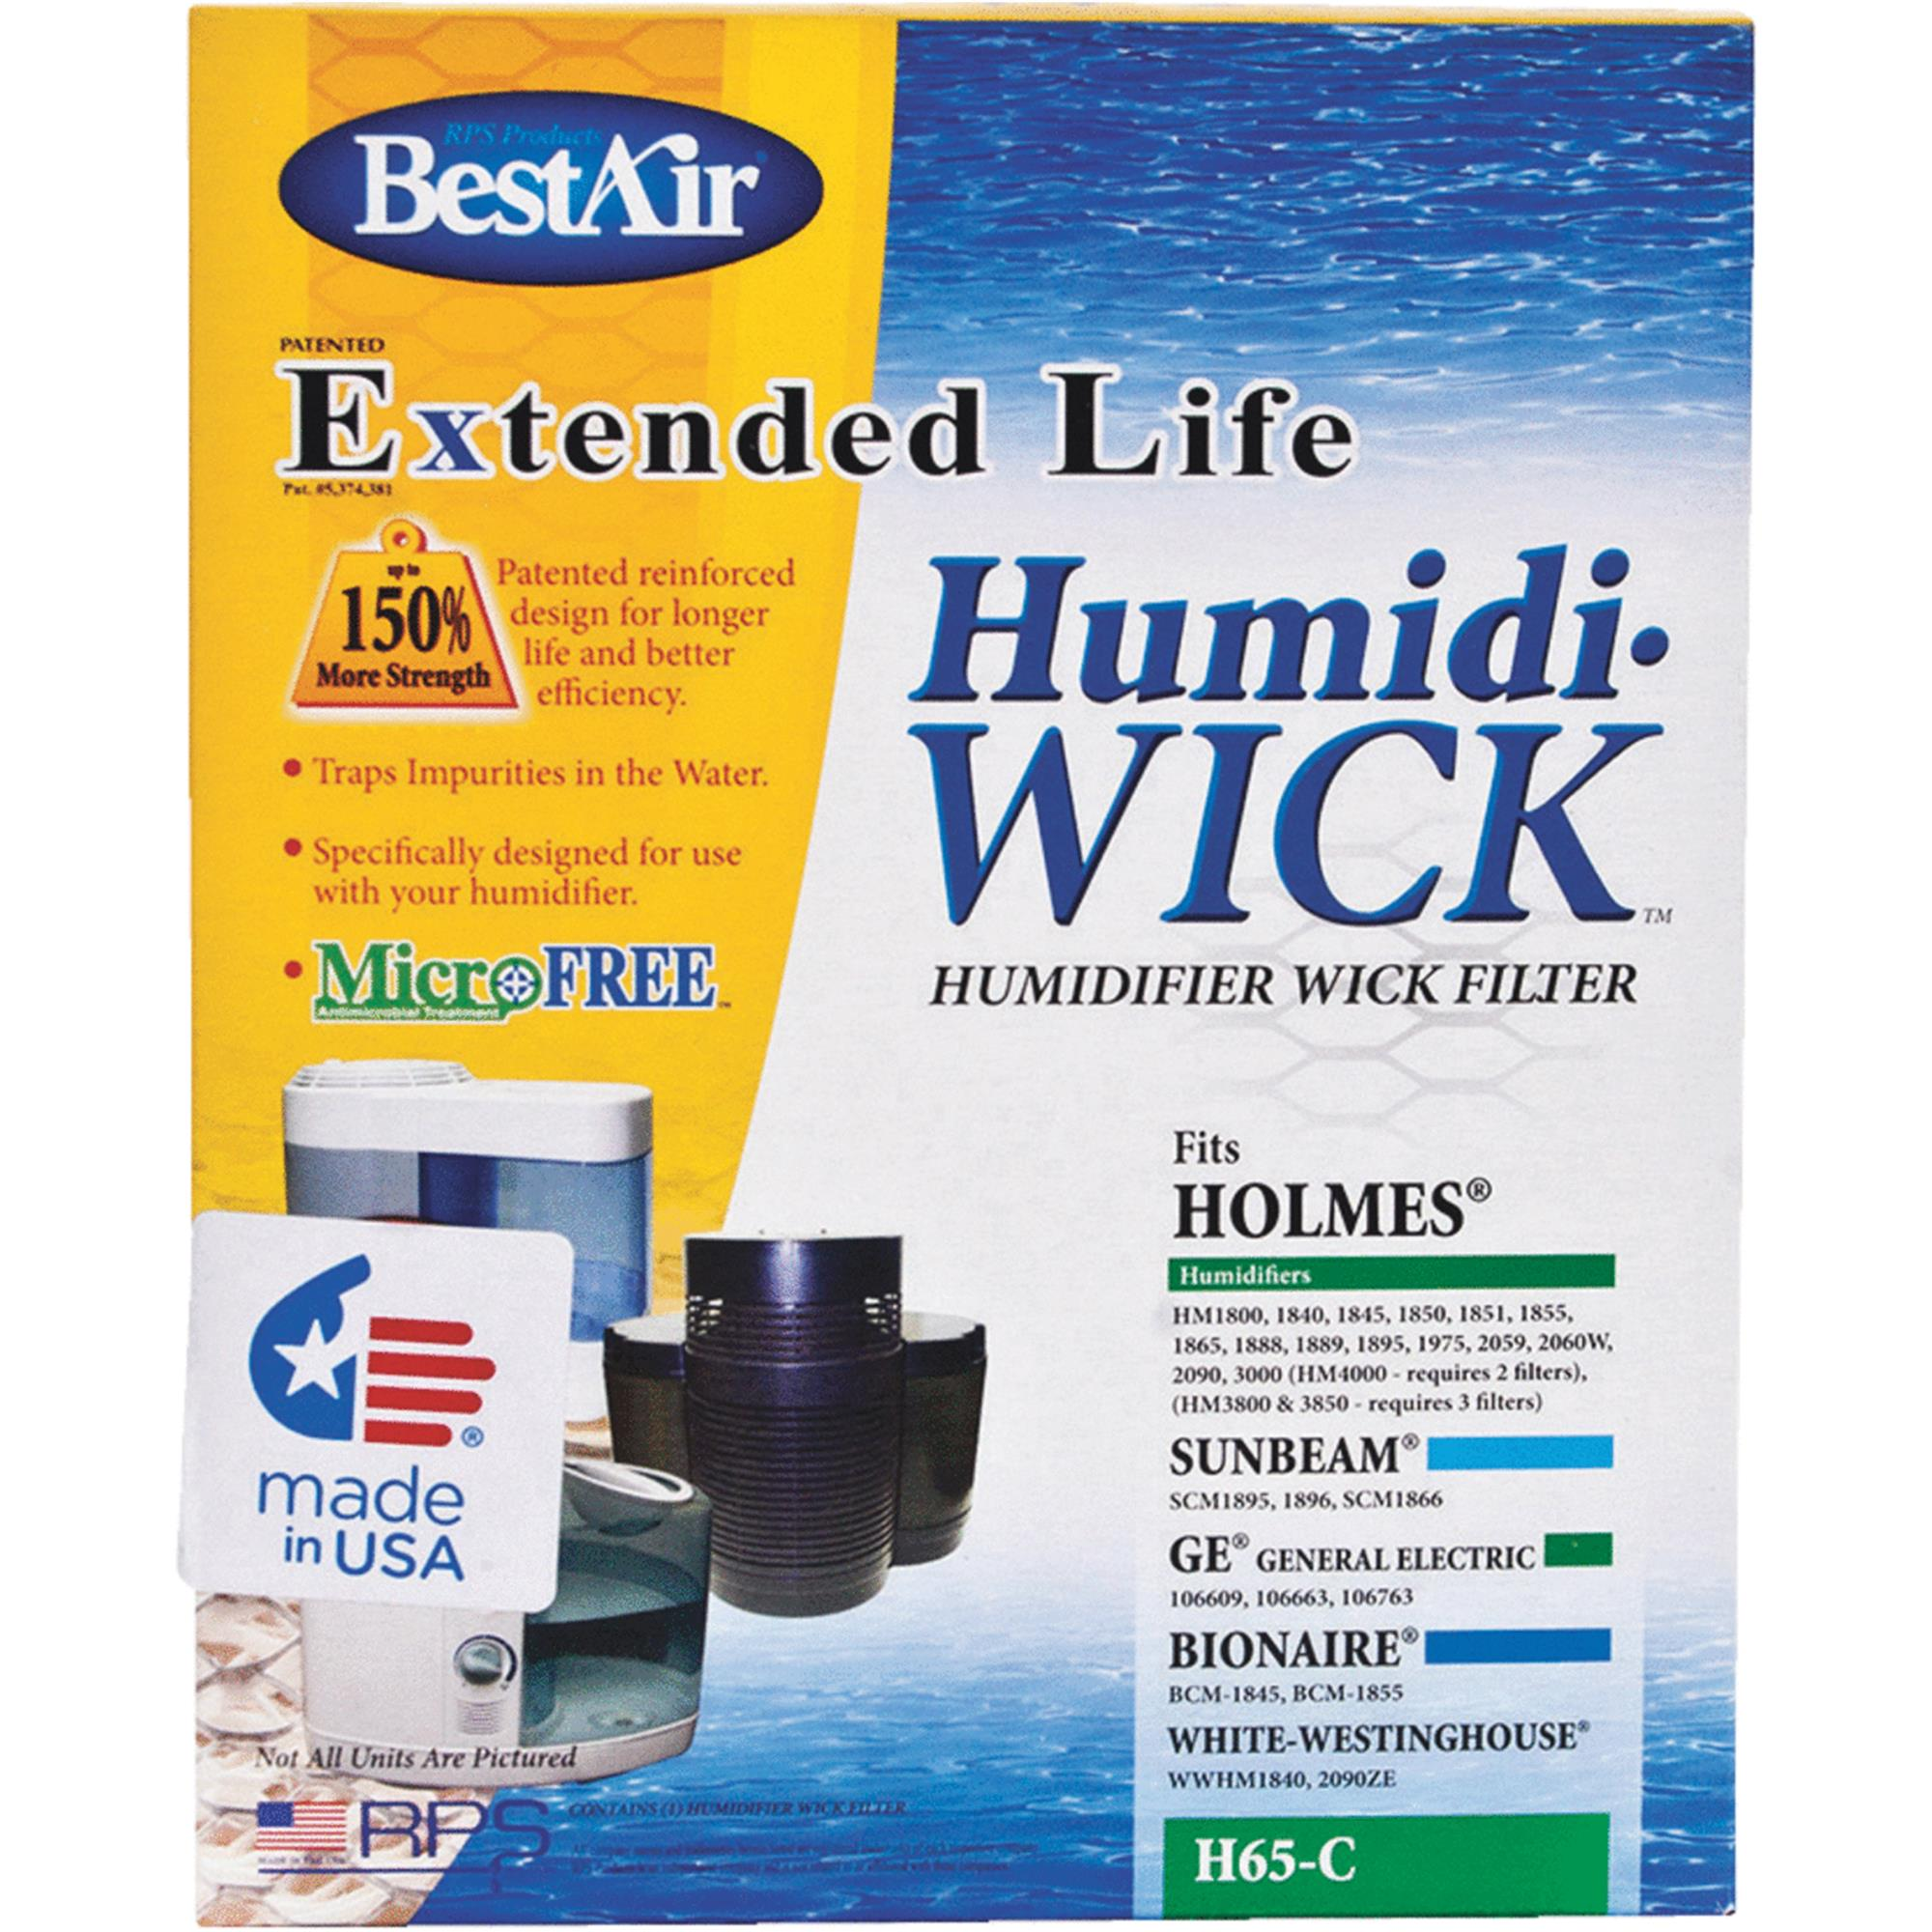 bestair extended life tabletop humidifier filter walmart com